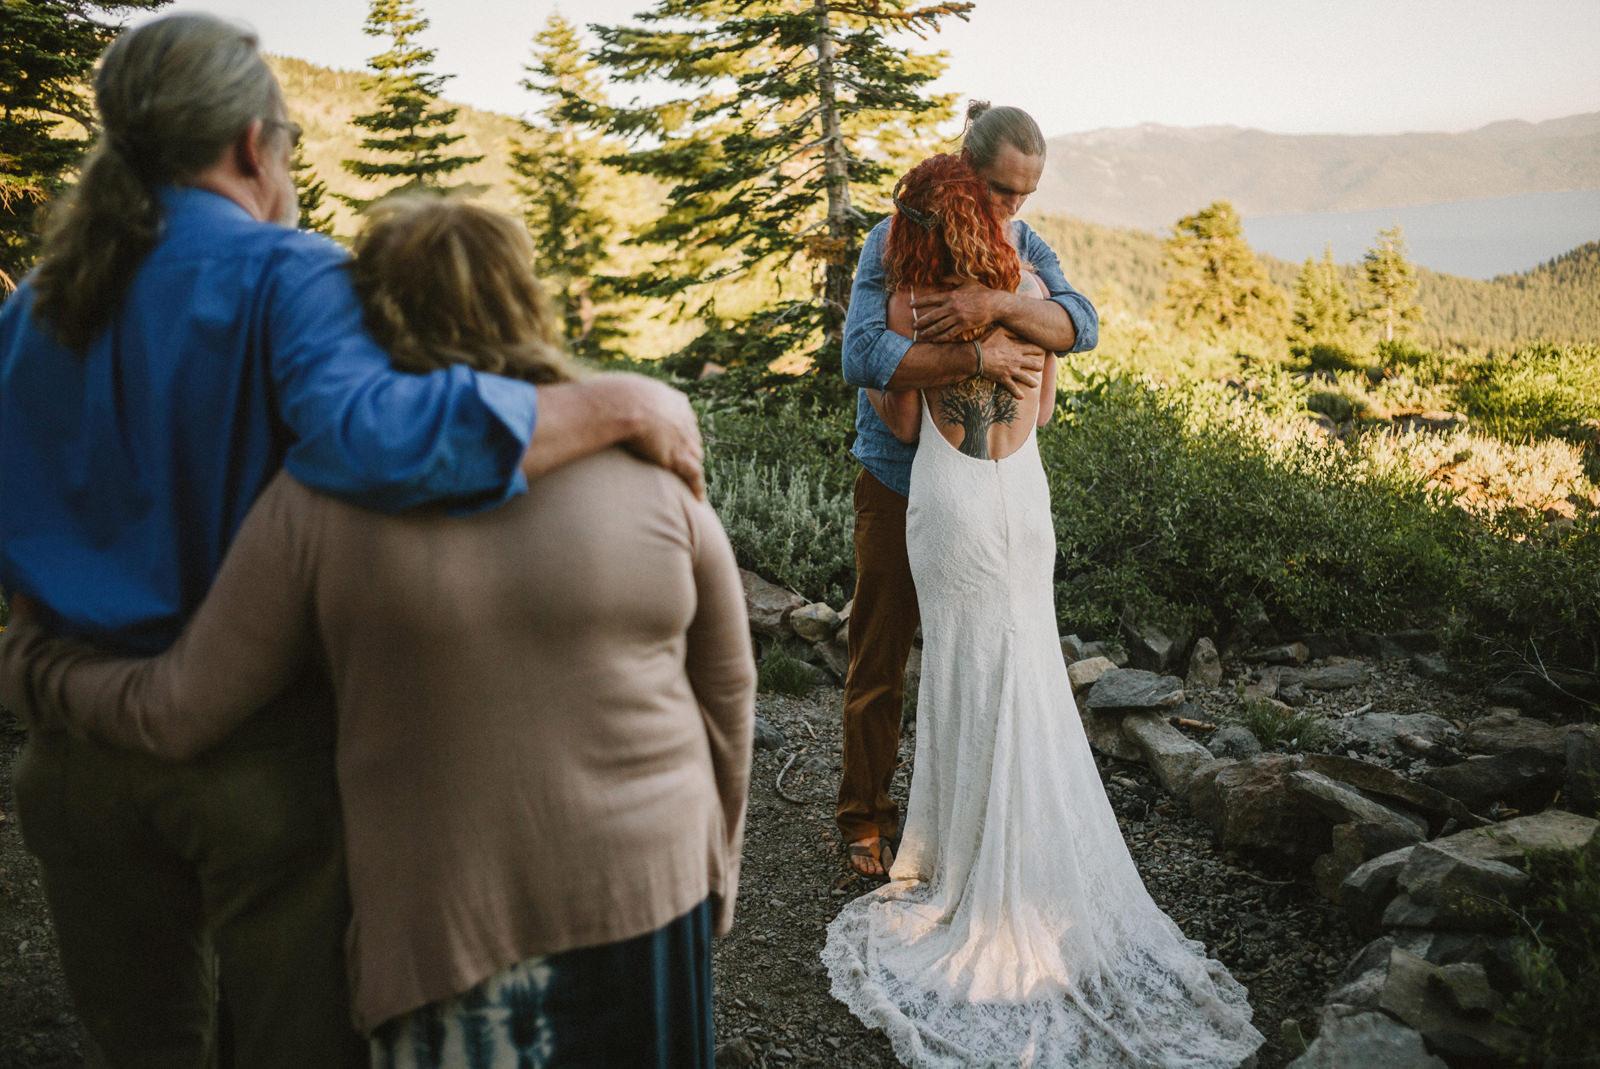 lake-tahoe-elopement-065 LAKE TAHOE ELOPEMENT